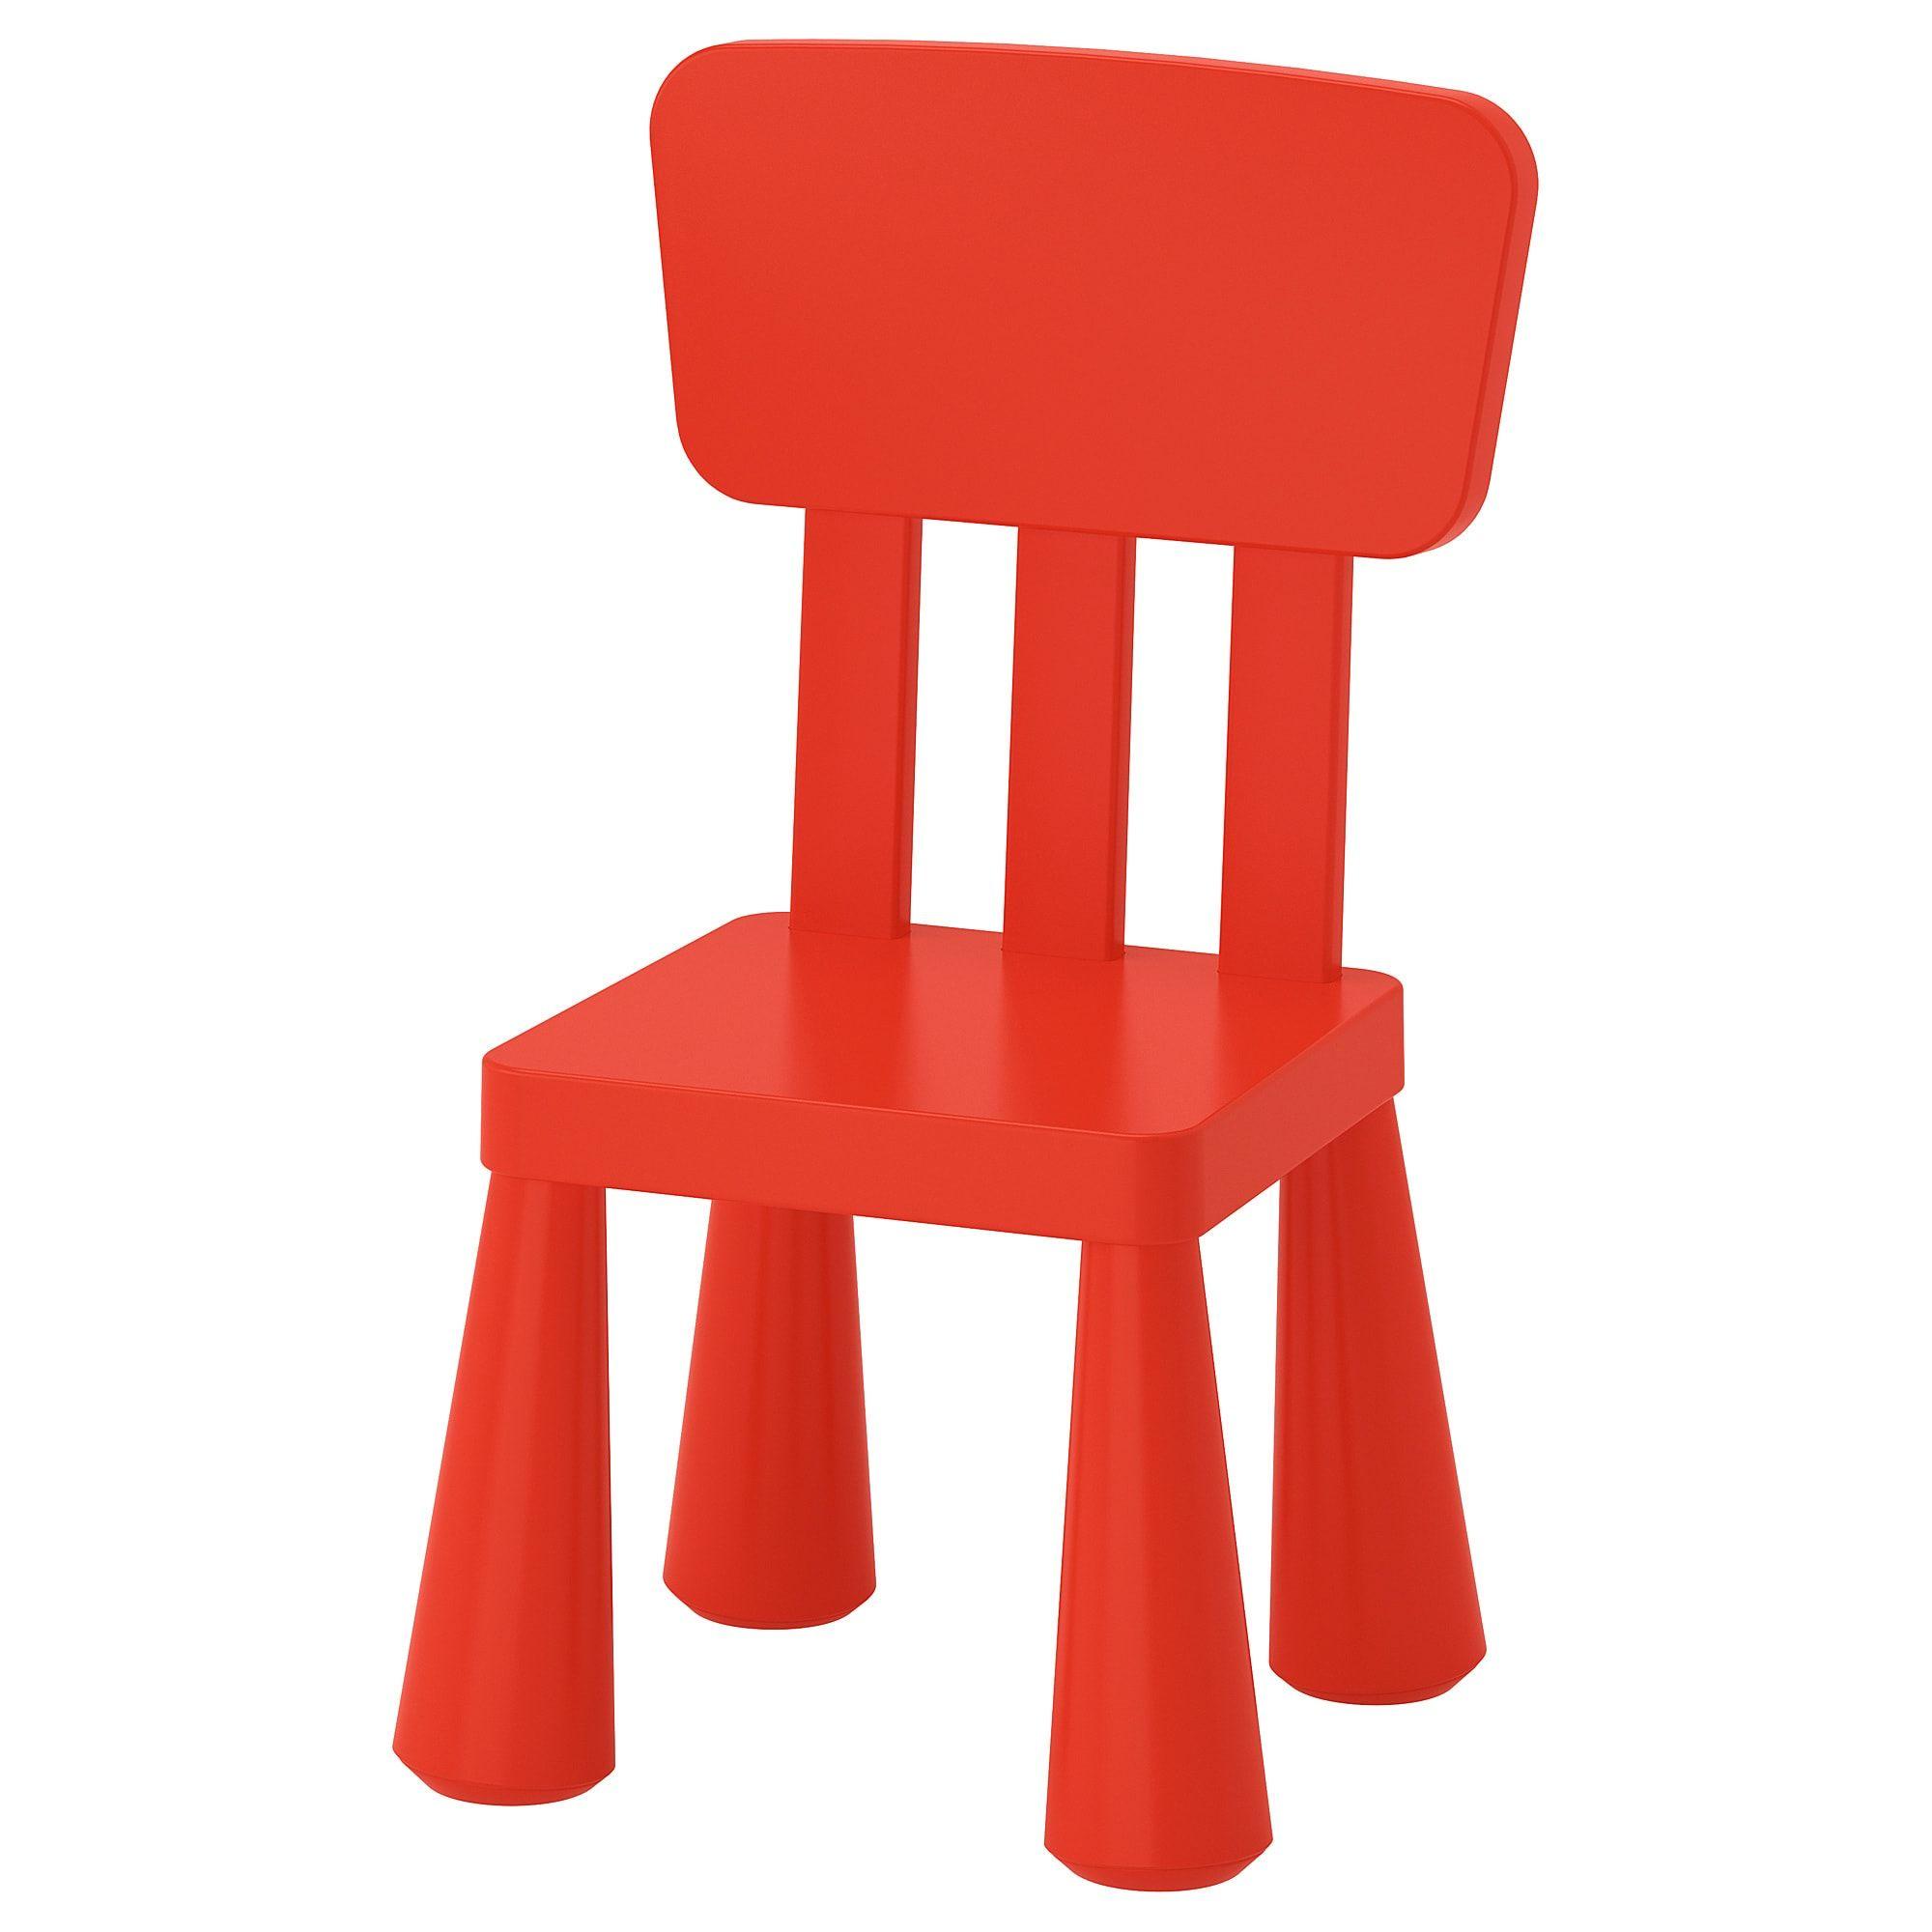 Sensational Ikea Mammut Indoor Outdoor Red Childrens Chair In 2019 Unemploymentrelief Wooden Chair Designs For Living Room Unemploymentrelieforg